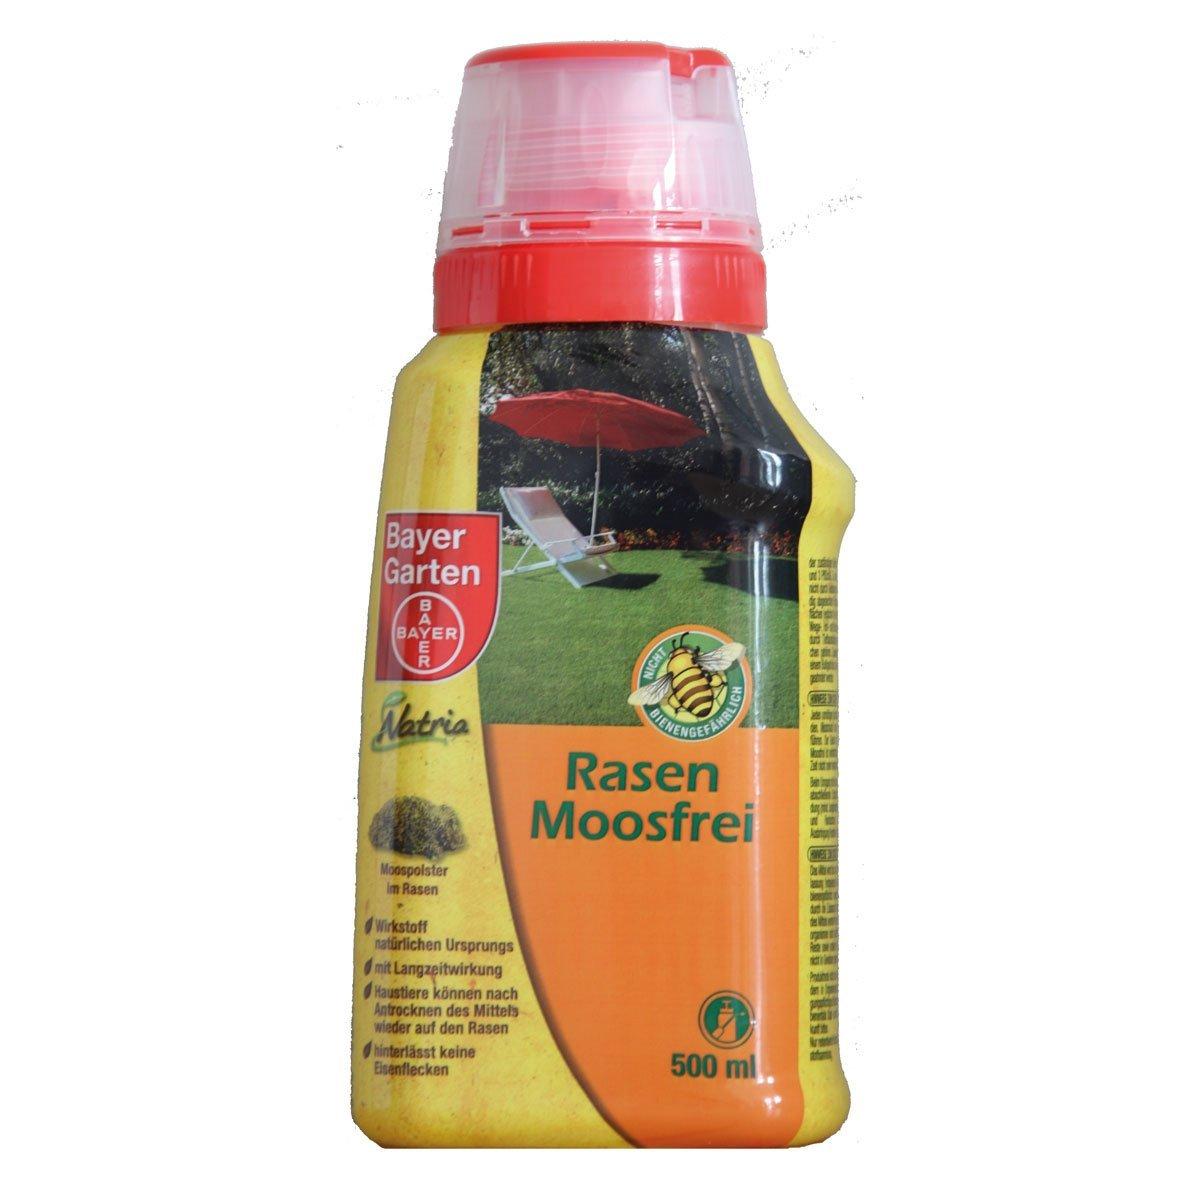 Bayer Rasen Moosfrei Anwendung